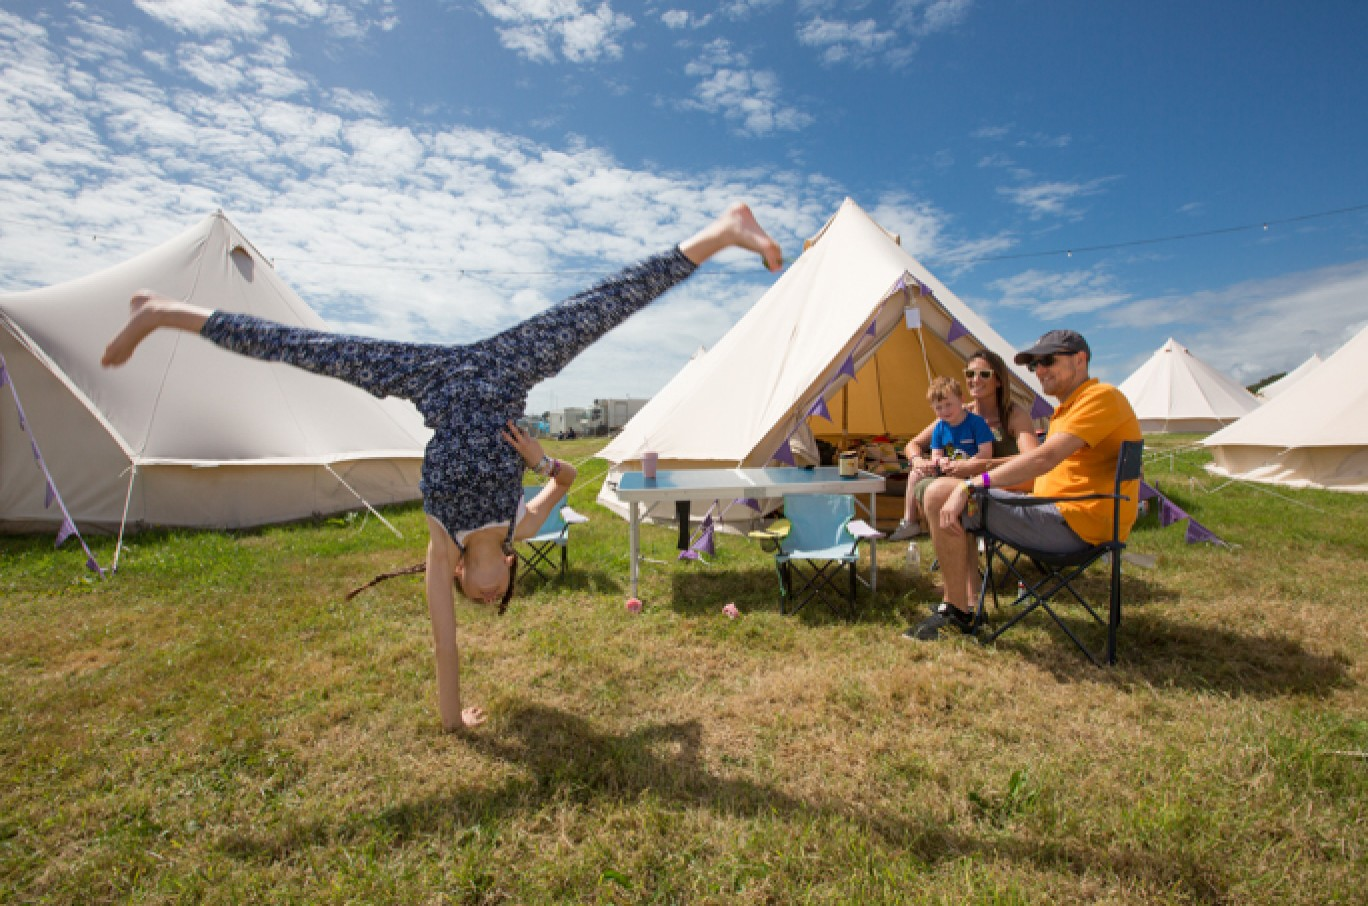 6_7-camp-bestival-thursday-0181501584974